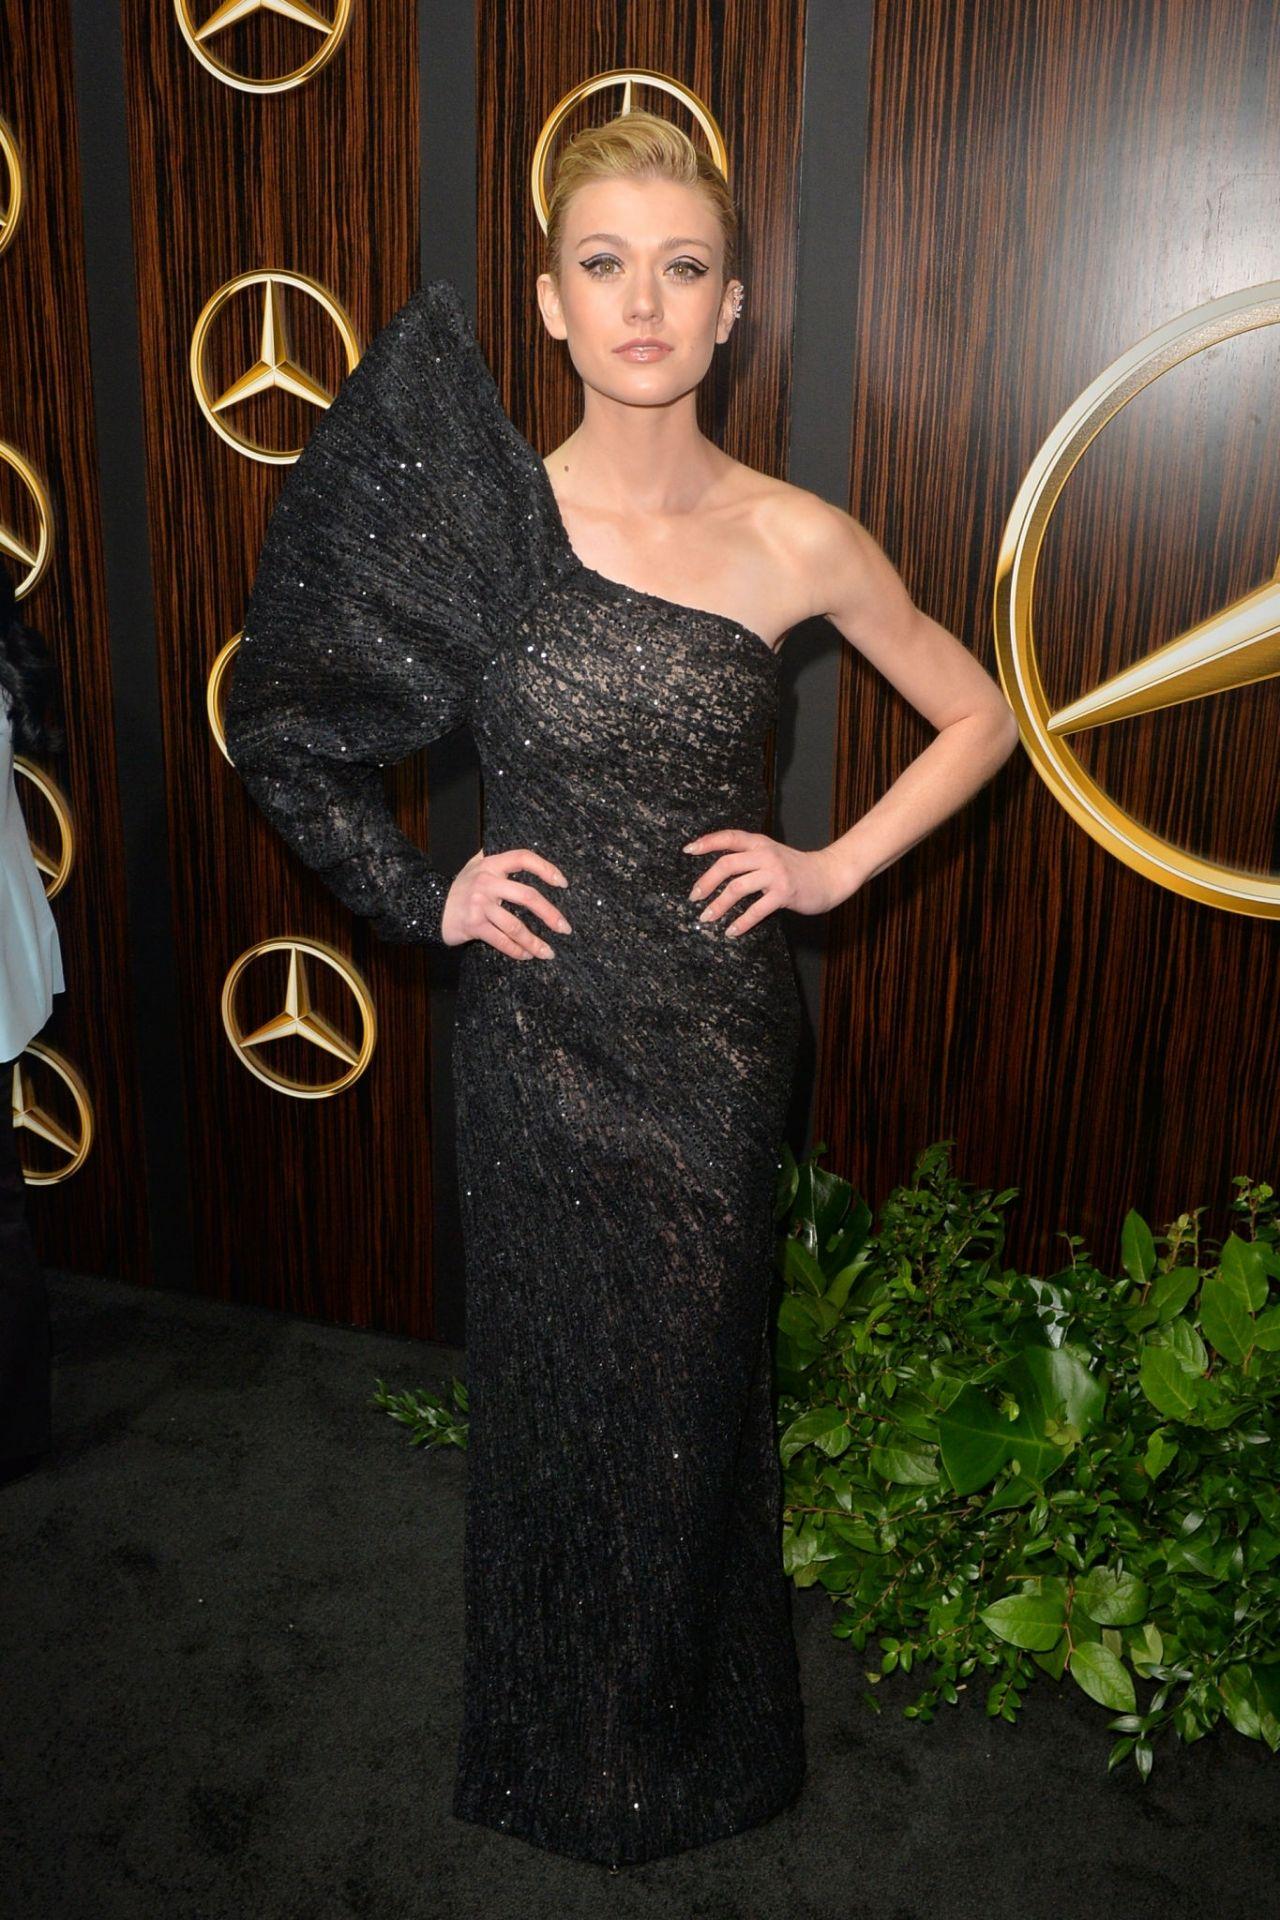 Katherine Mcnamara 2019 Mercedes Benz Usa Awards Viewing Party